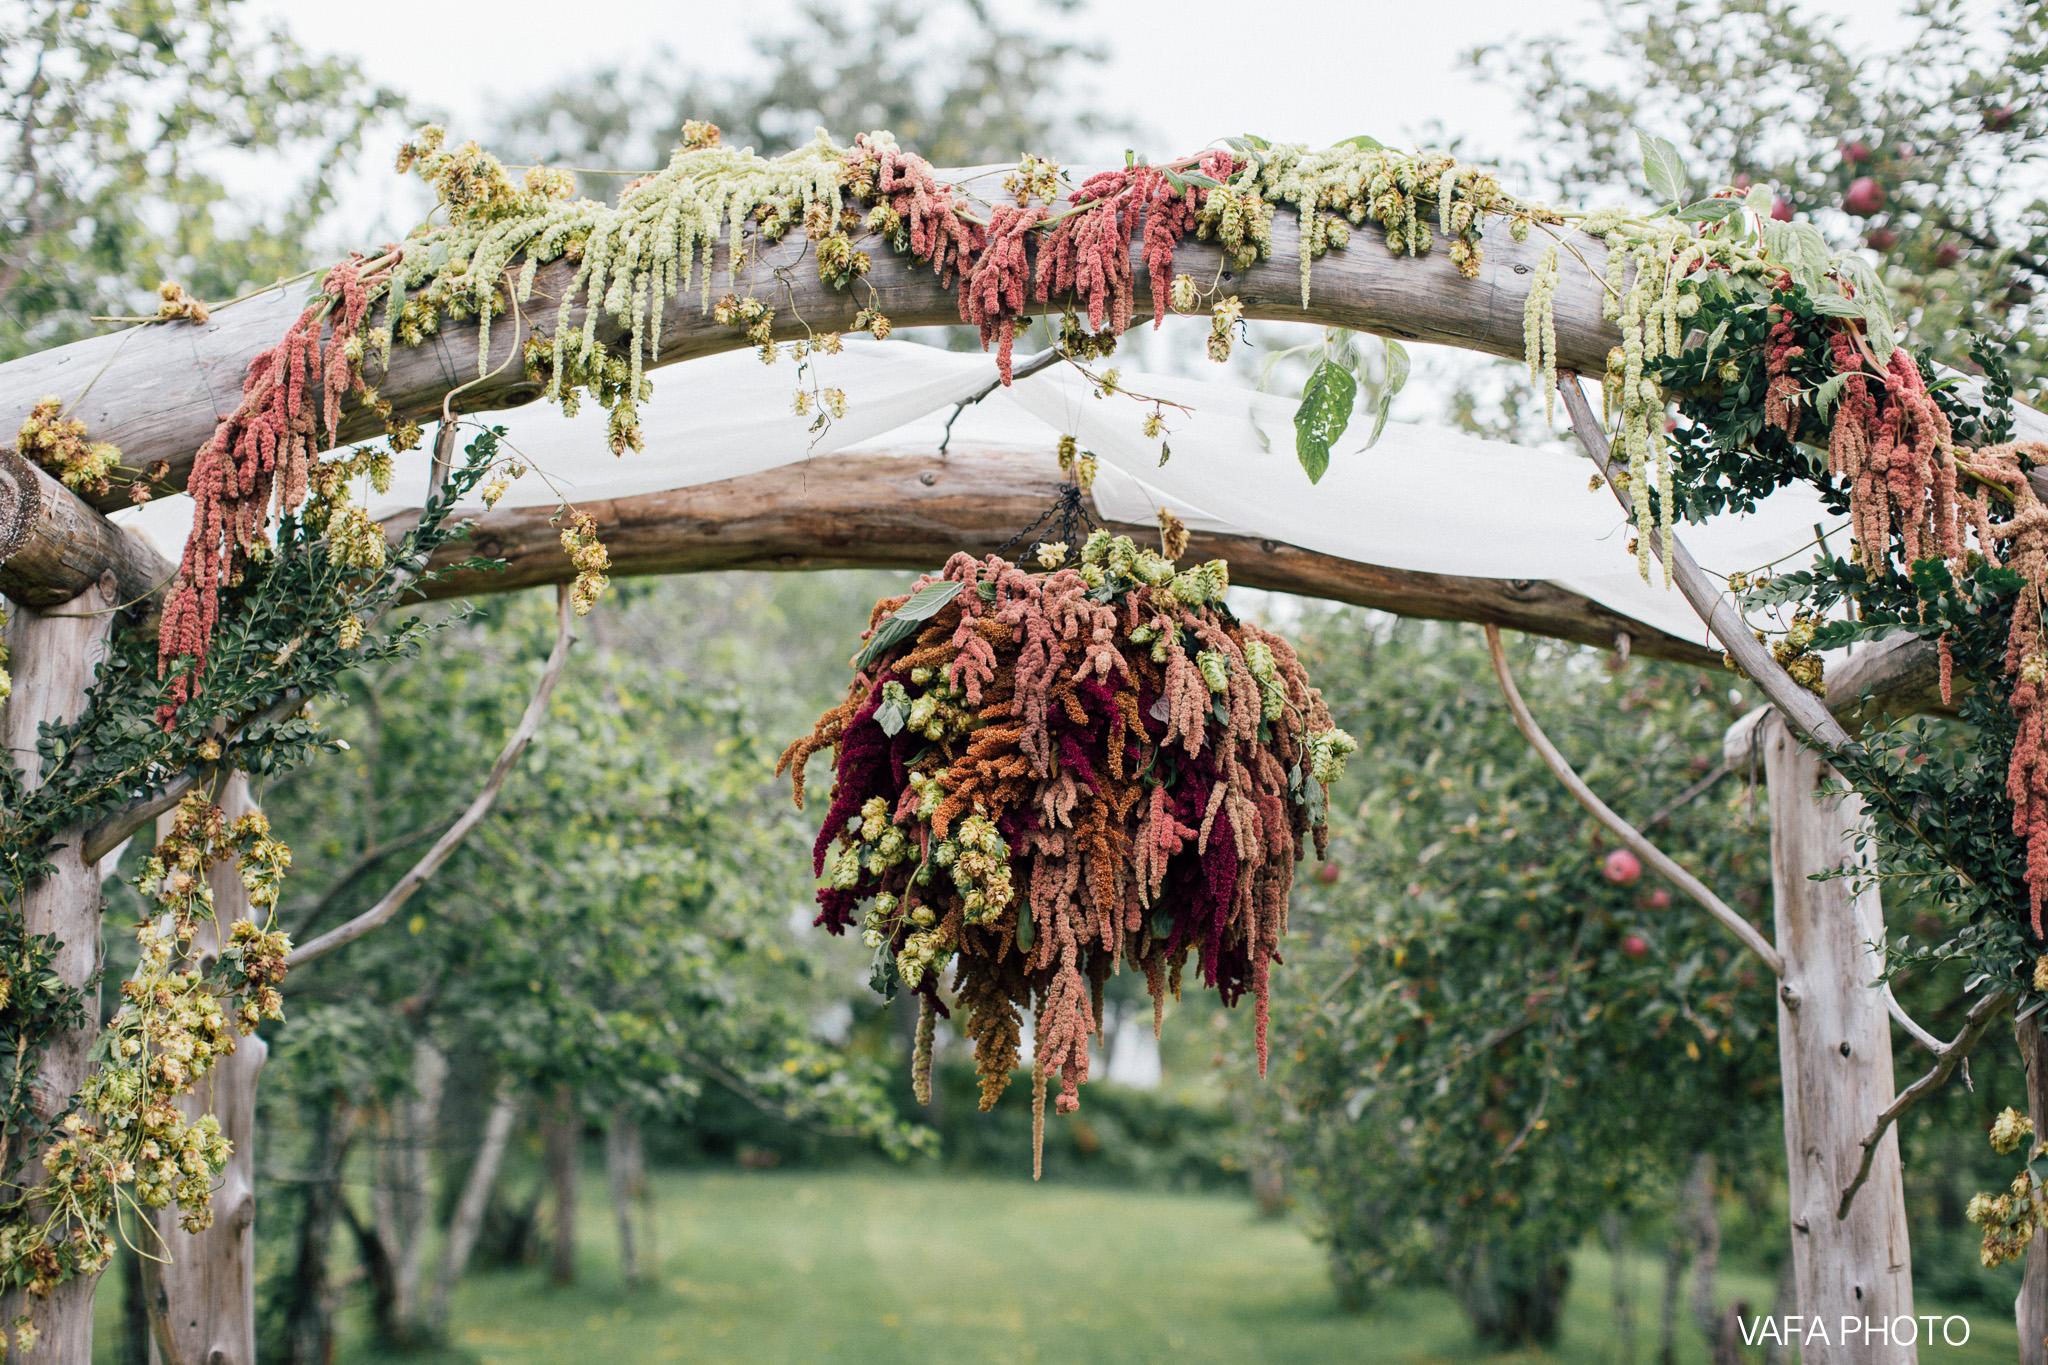 Belsolda-Farm-Wedding-Christy-Eric-Vafa-Photo-355.jpg